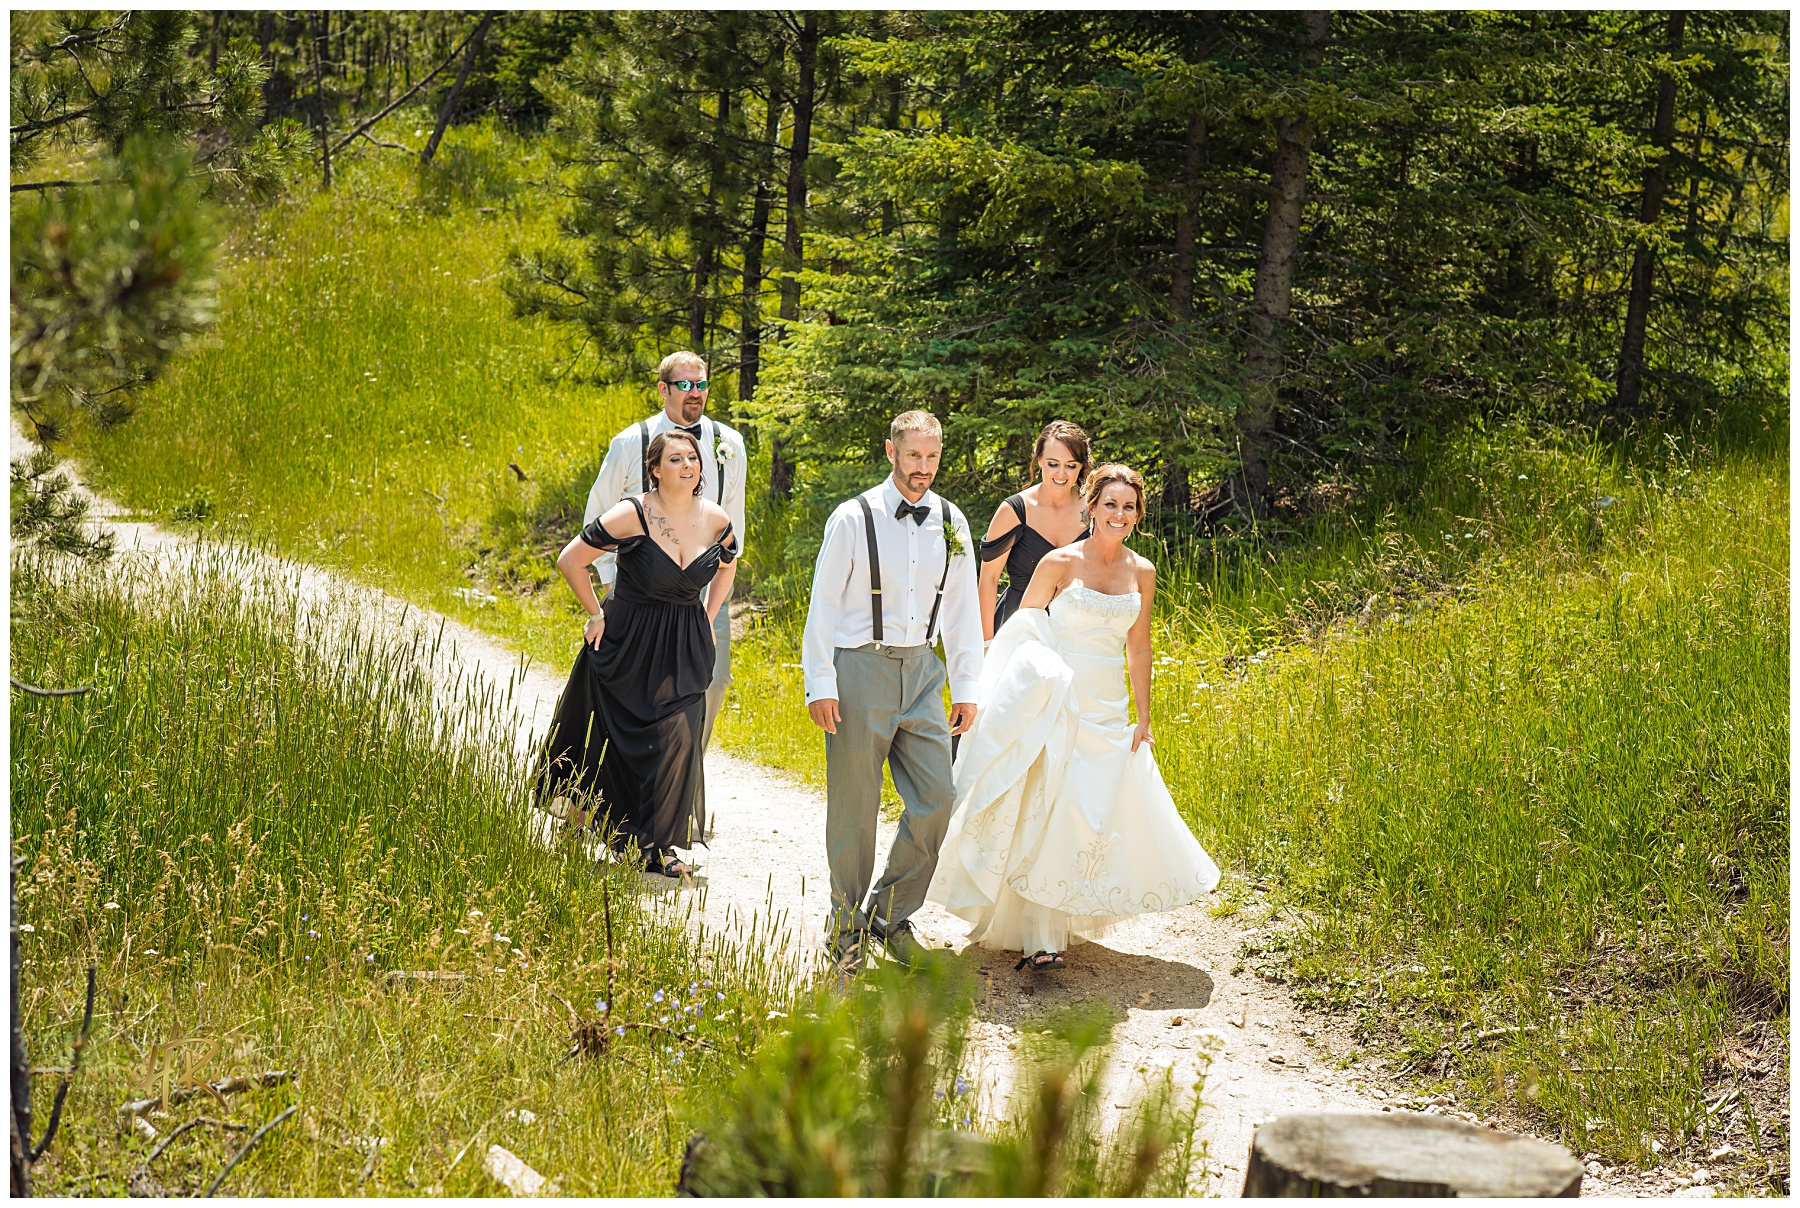 Wedding Photographer032.jpg